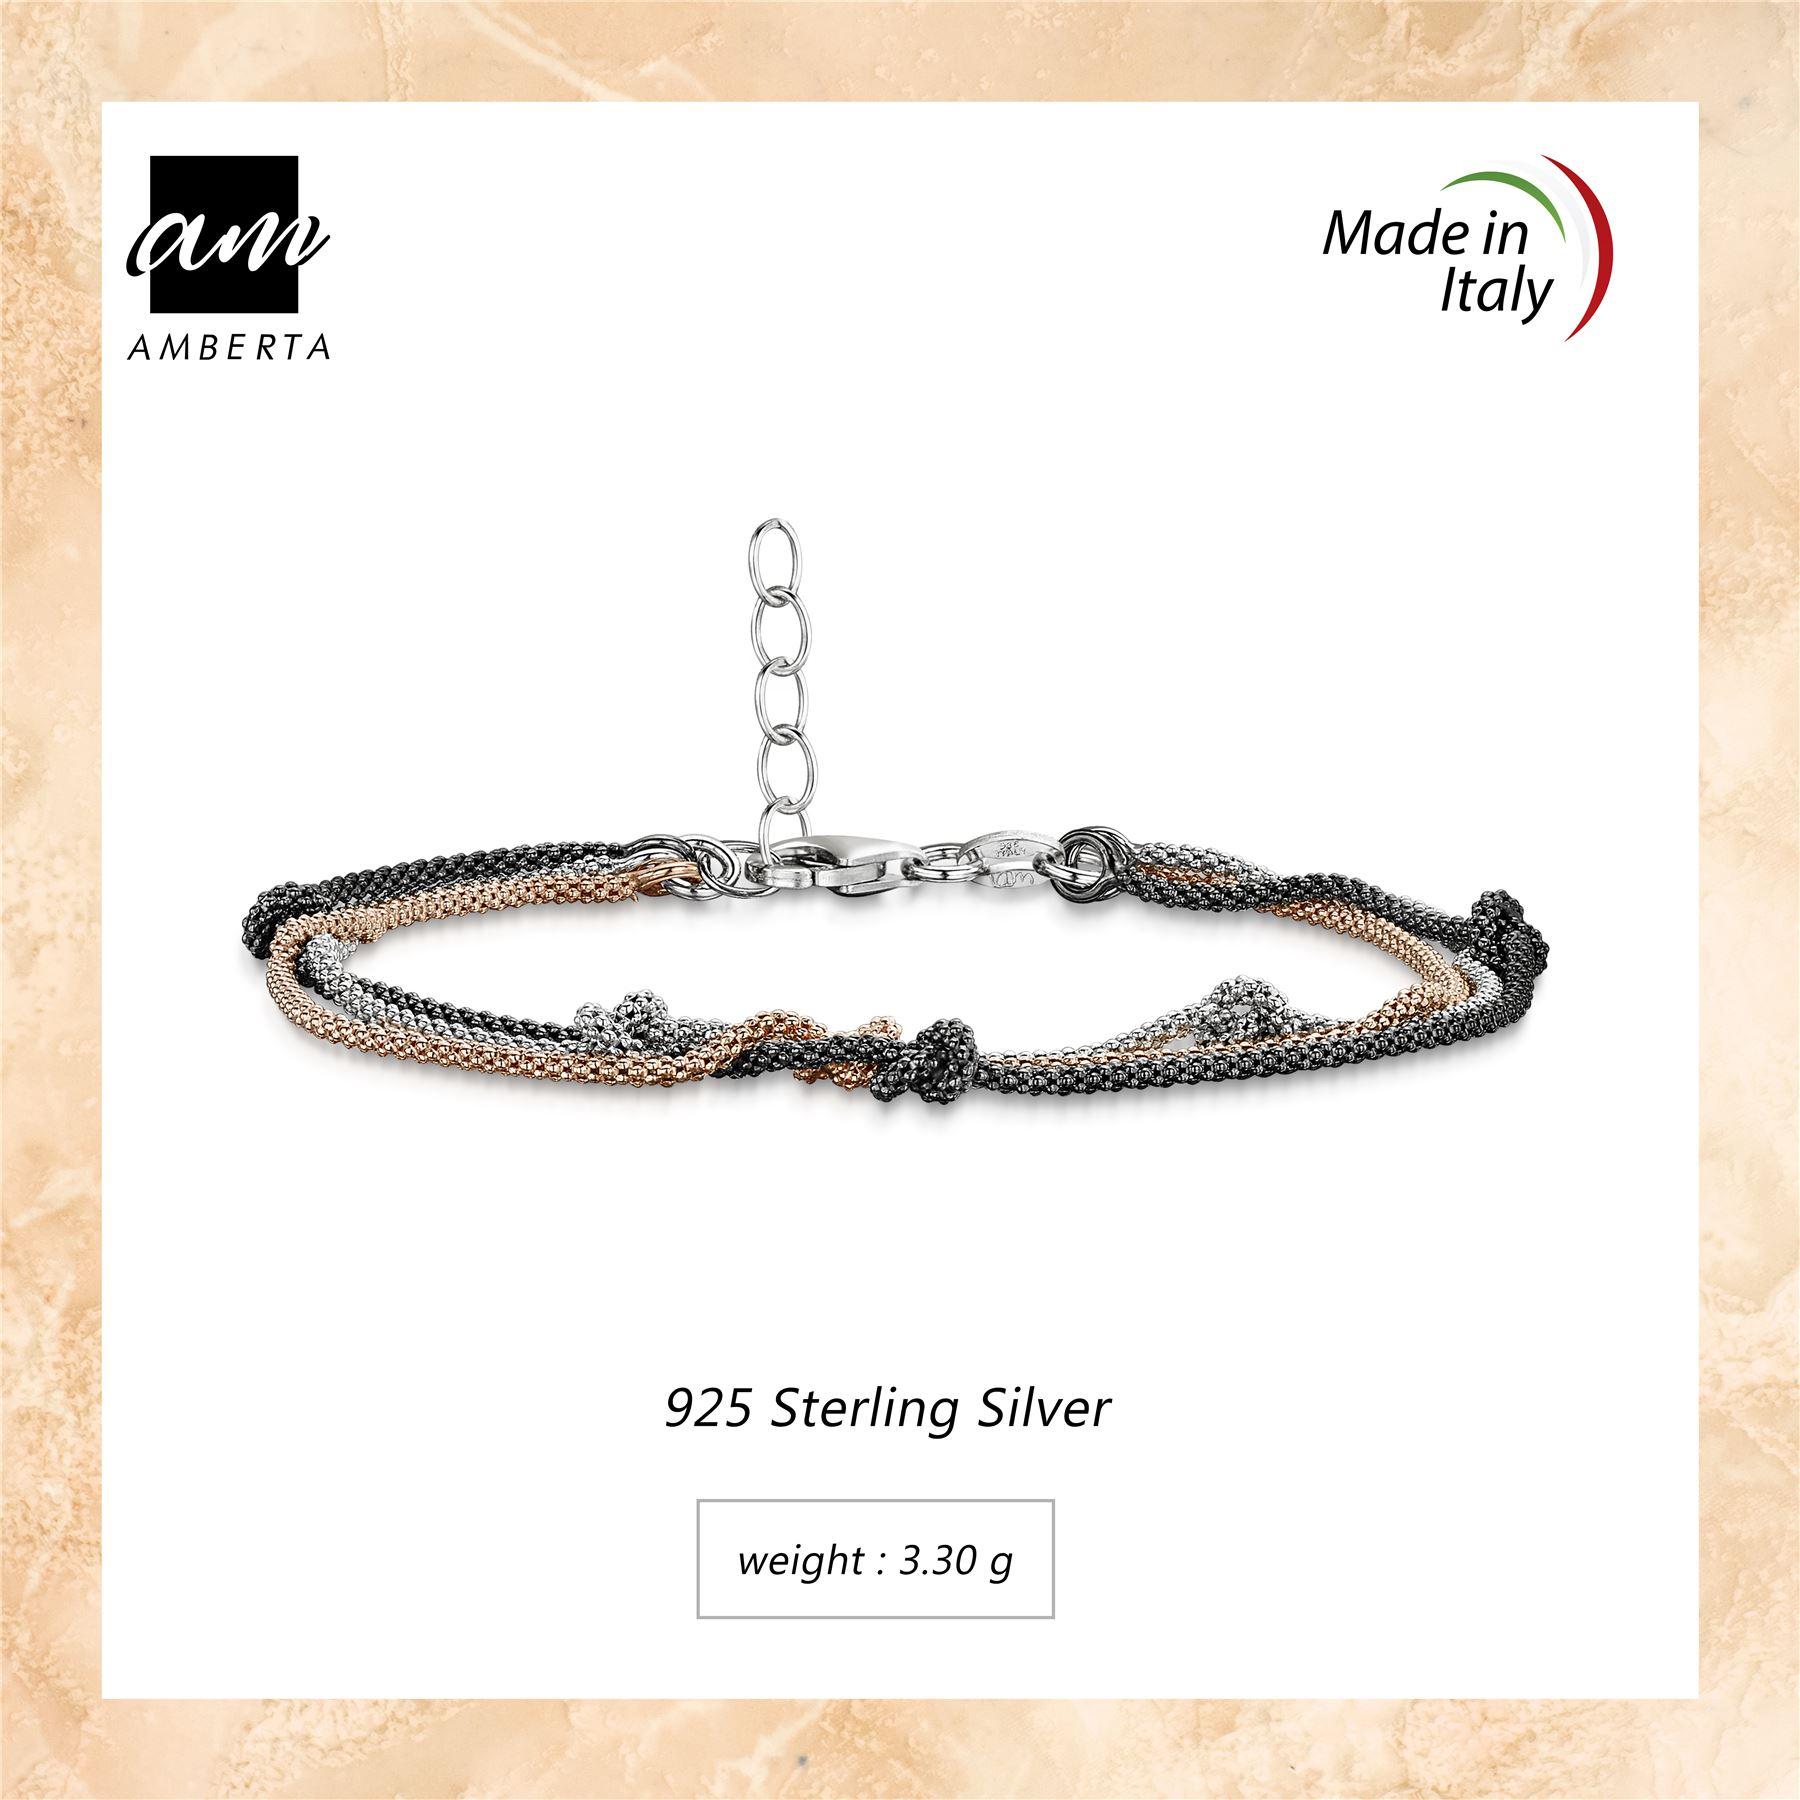 Amberta-925-Sterling-Silver-Adjustable-Multi-Layered-Chain-Bracelet-for-Women miniature 10